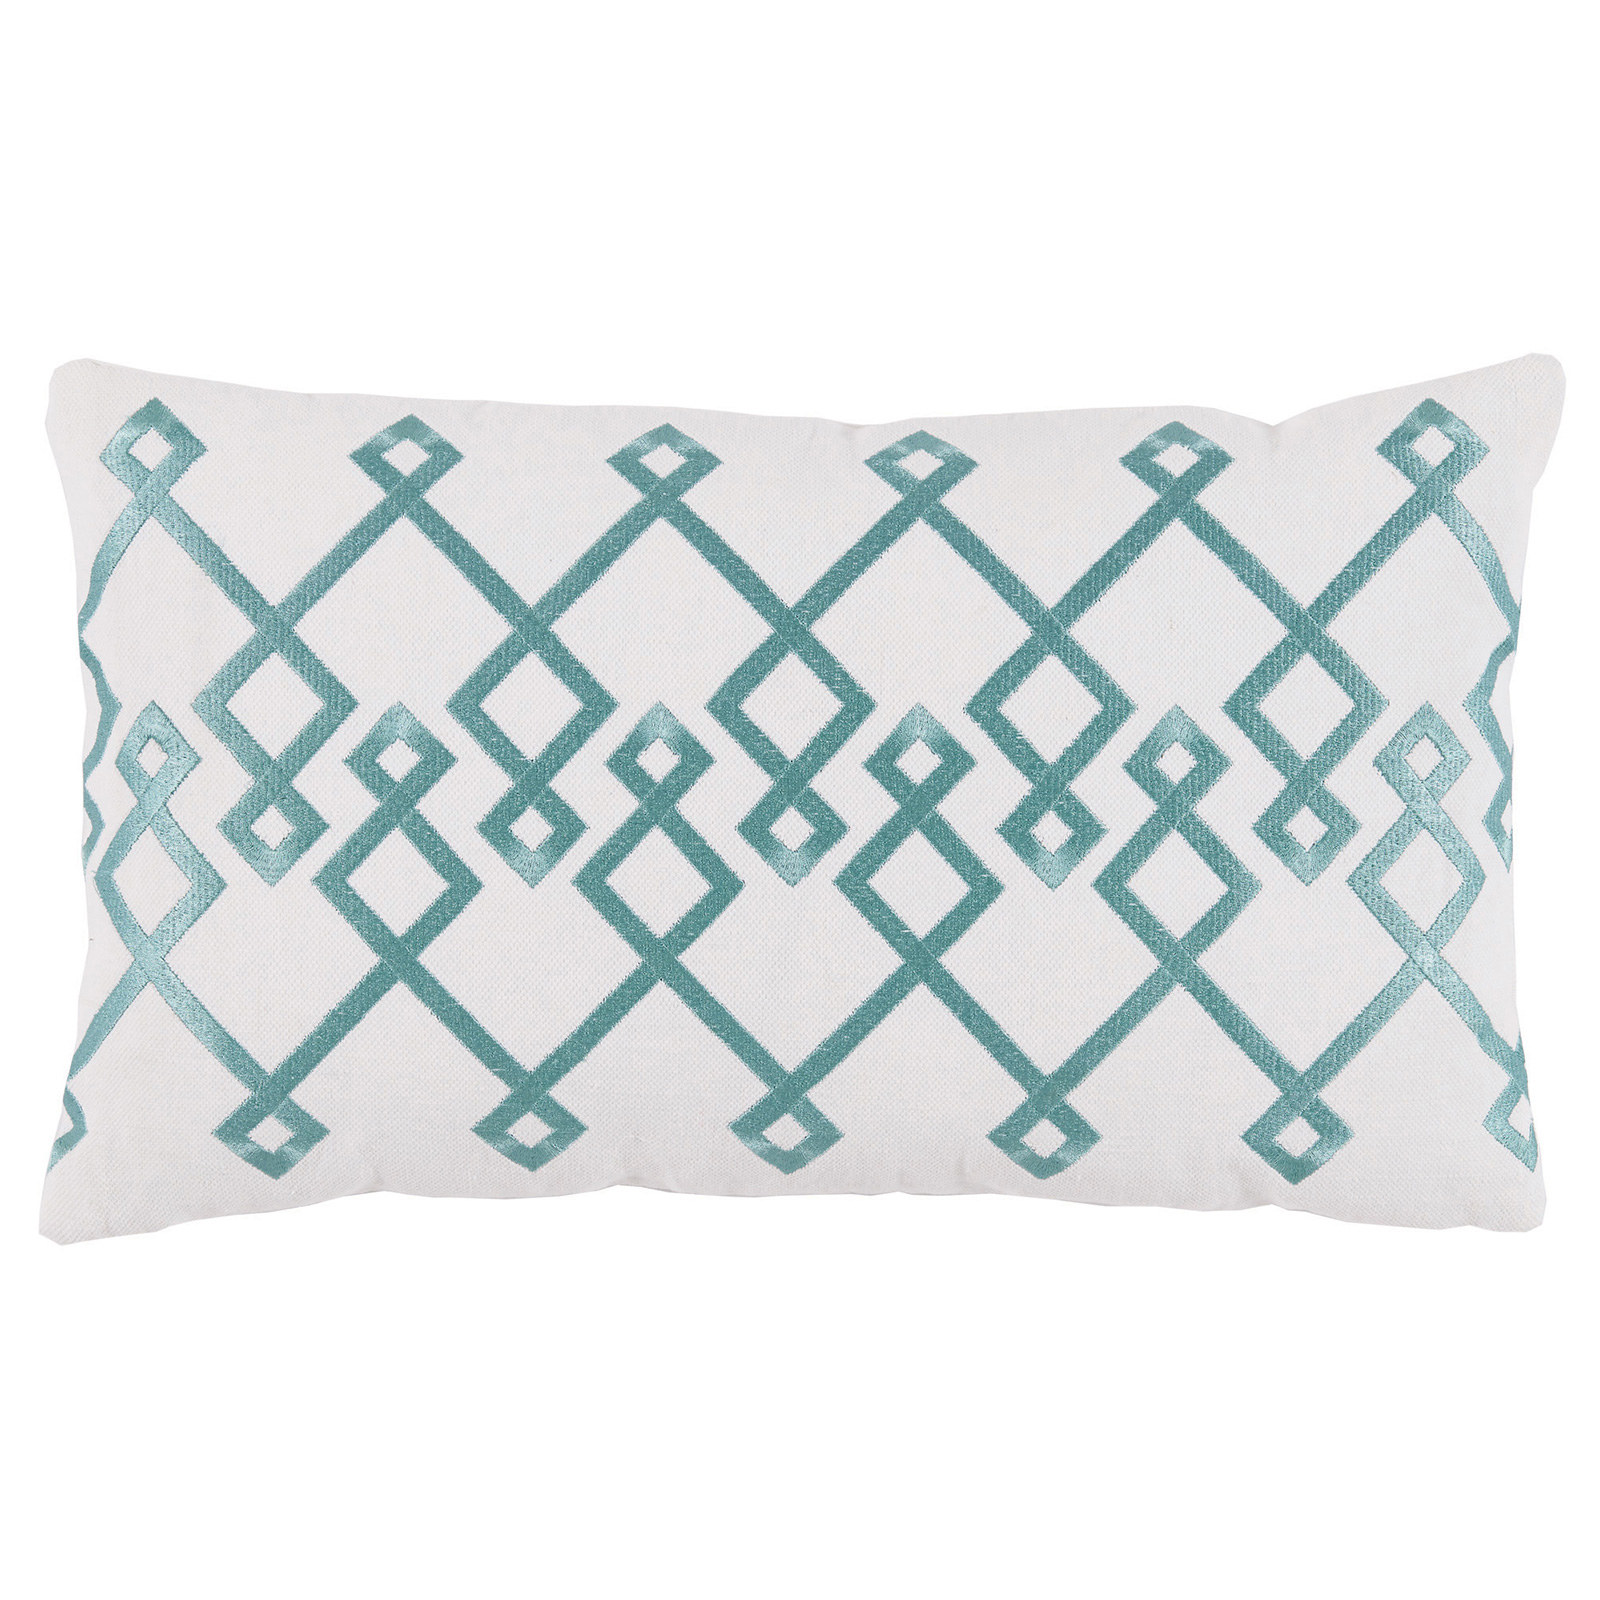 Steph Modern Mineral Chevron Embroidery White Pillow - 13x22